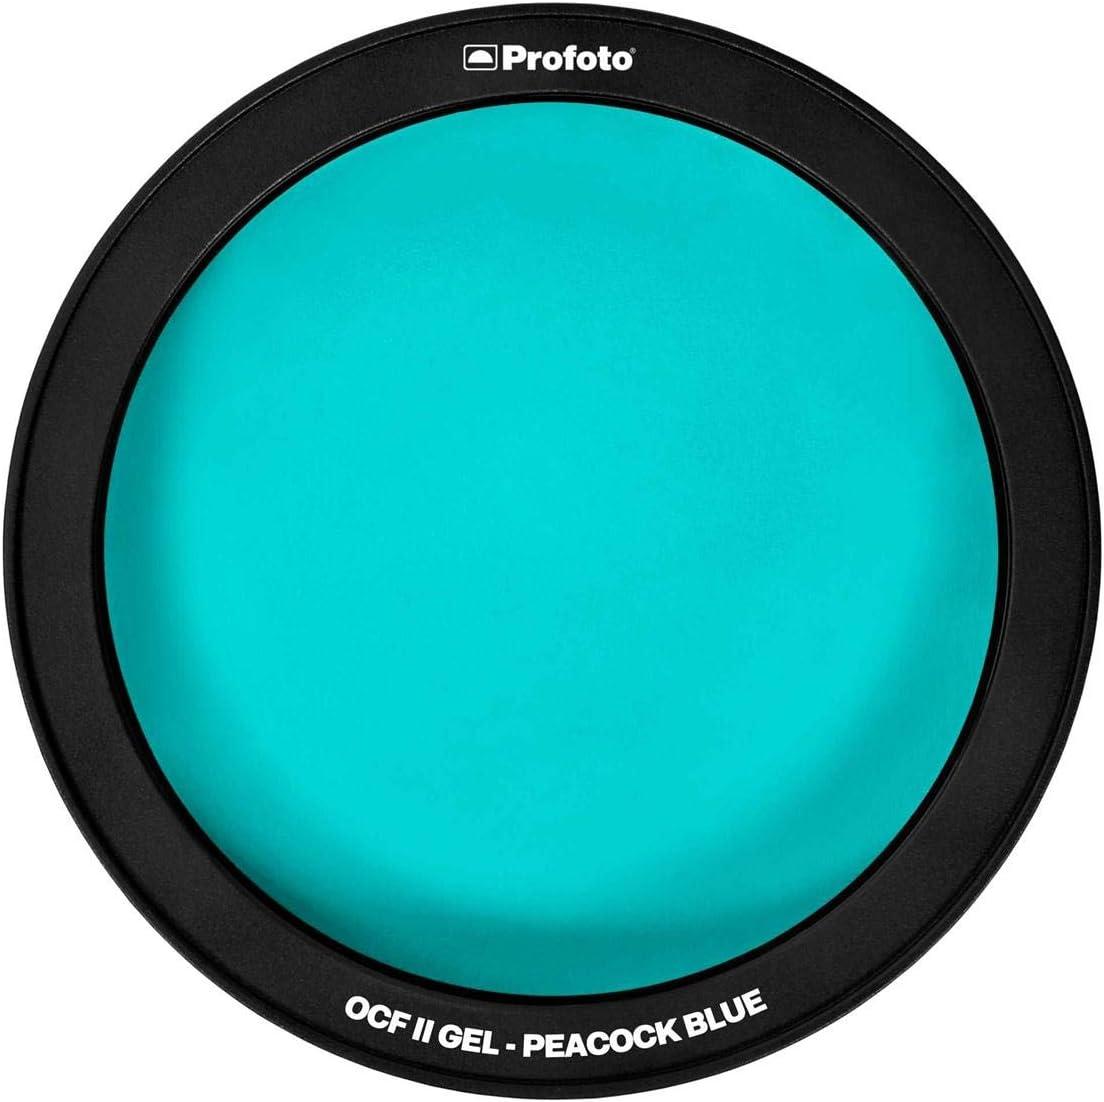 Peacock Blue Profoto Off Camera Flash II Gel OCF